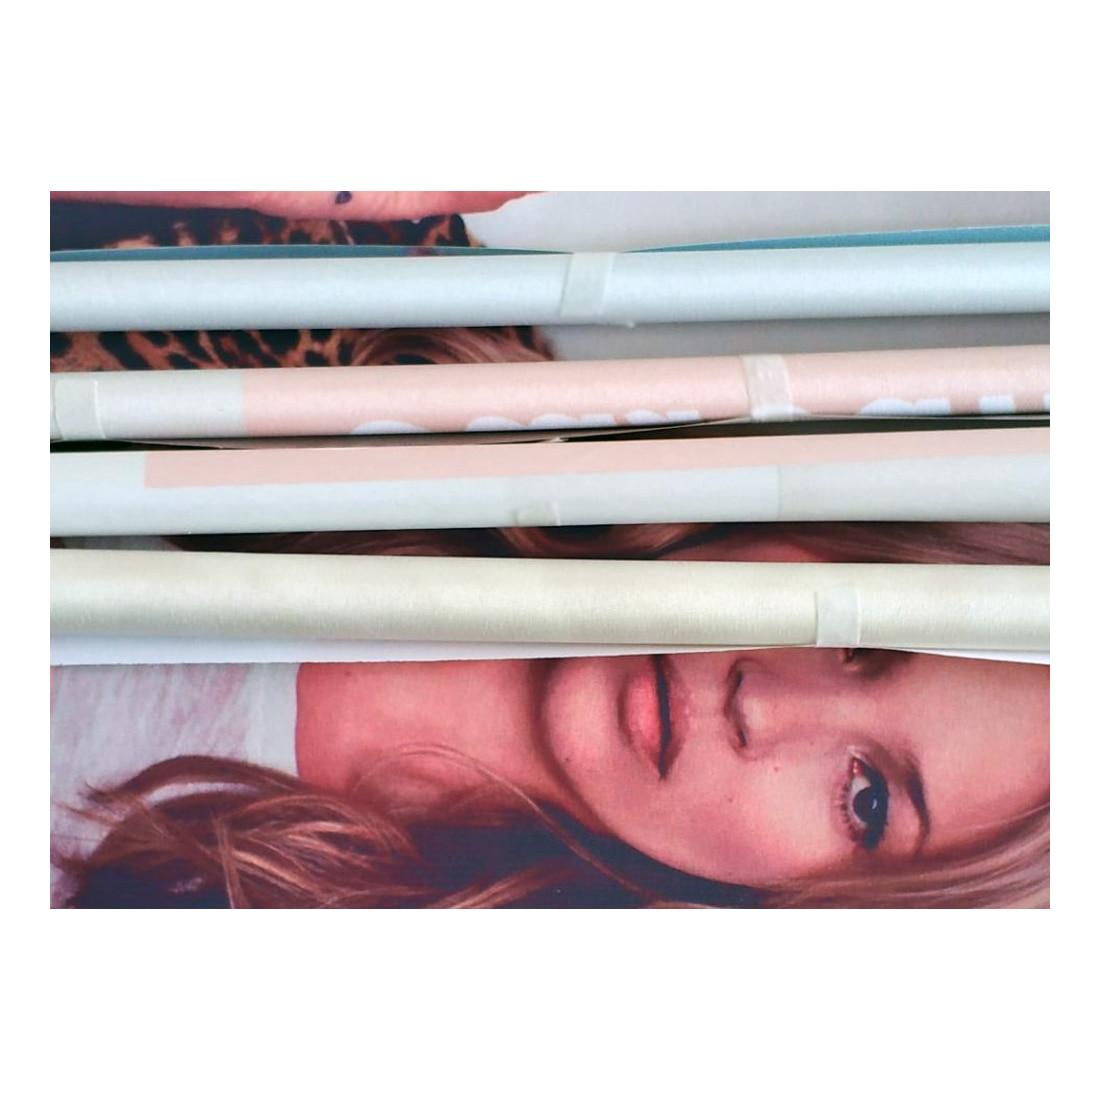 Купить с кэшбэком C478 Art Painting Poster Billie Eilish Music Singer Hot Gift Room Decor Print Wall Picture Canvas 20x30cm 24x36in